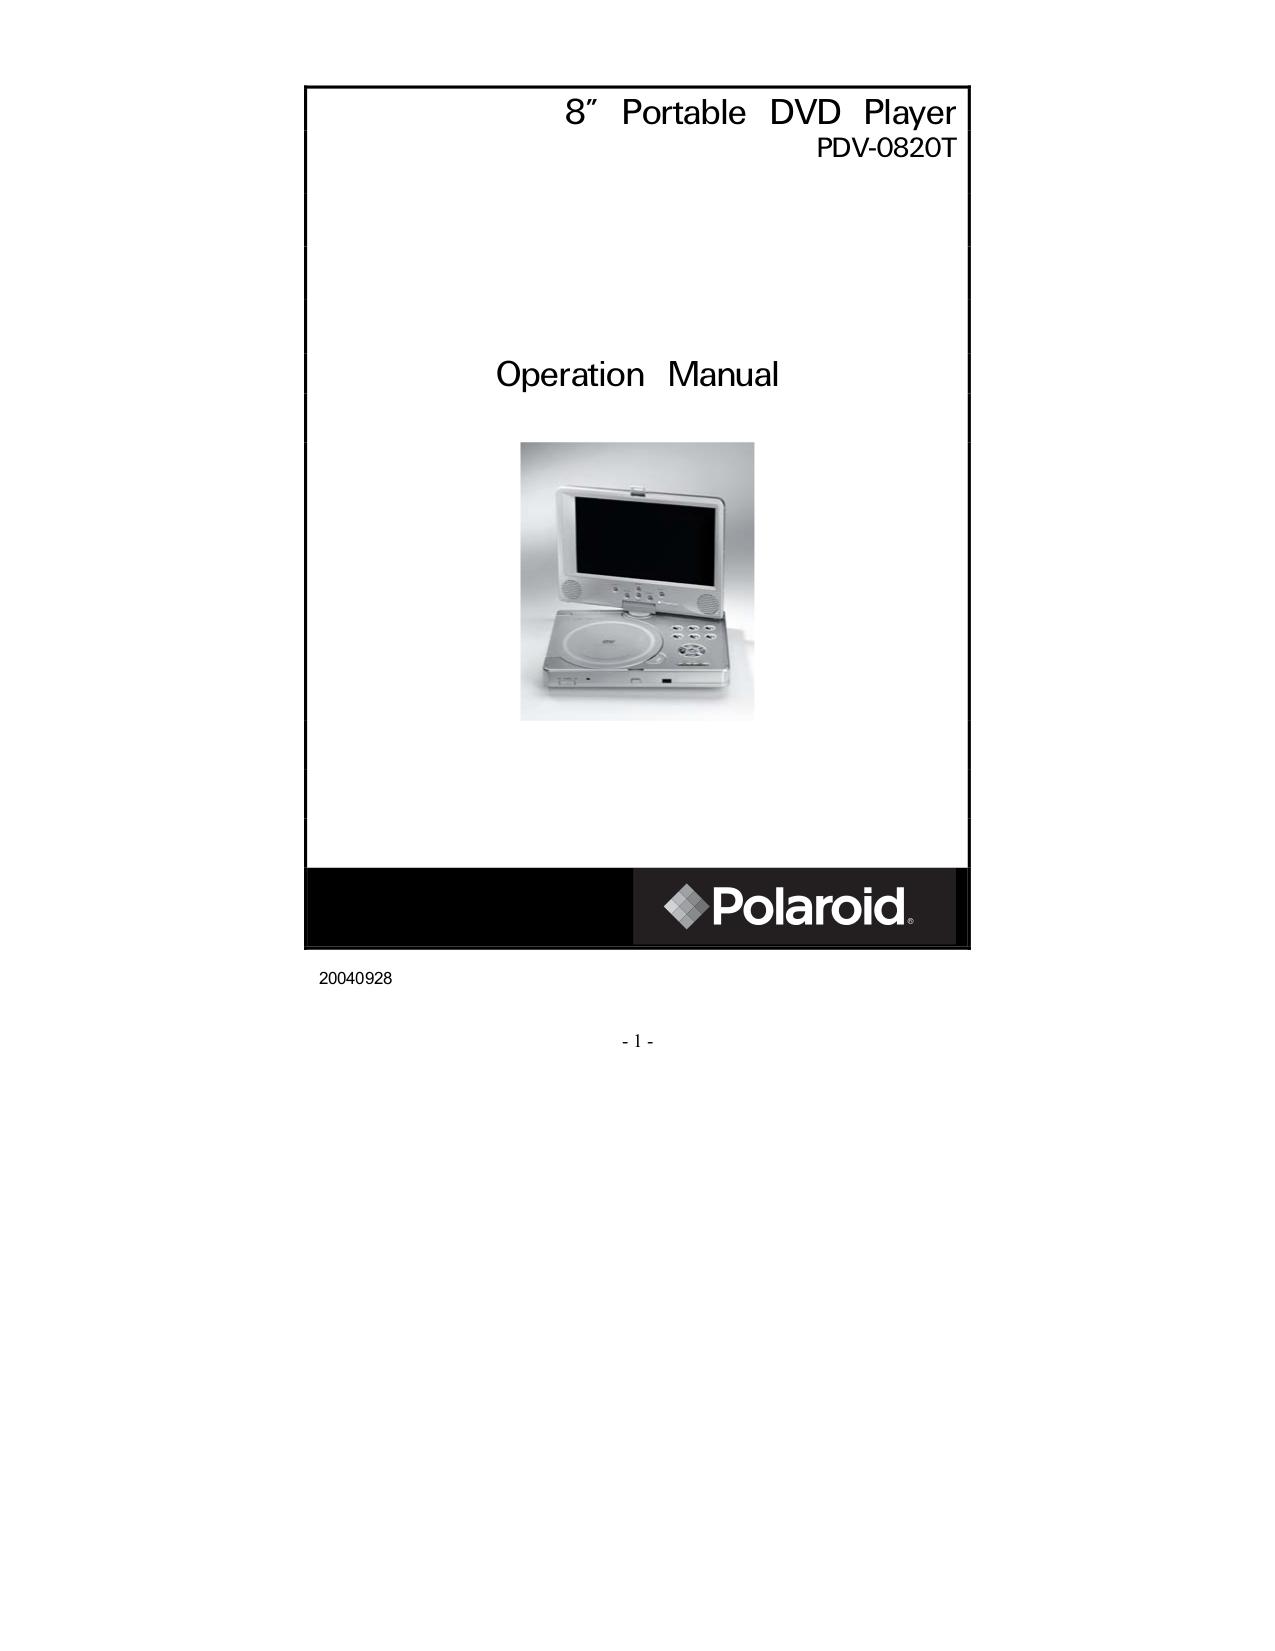 download free pdf for polaroid pdv 0820t portable dvd player manual rh umlib com Polaroid Portable DVD Player PDM-0711 Lens Polaroid Portable DVD Player Battery